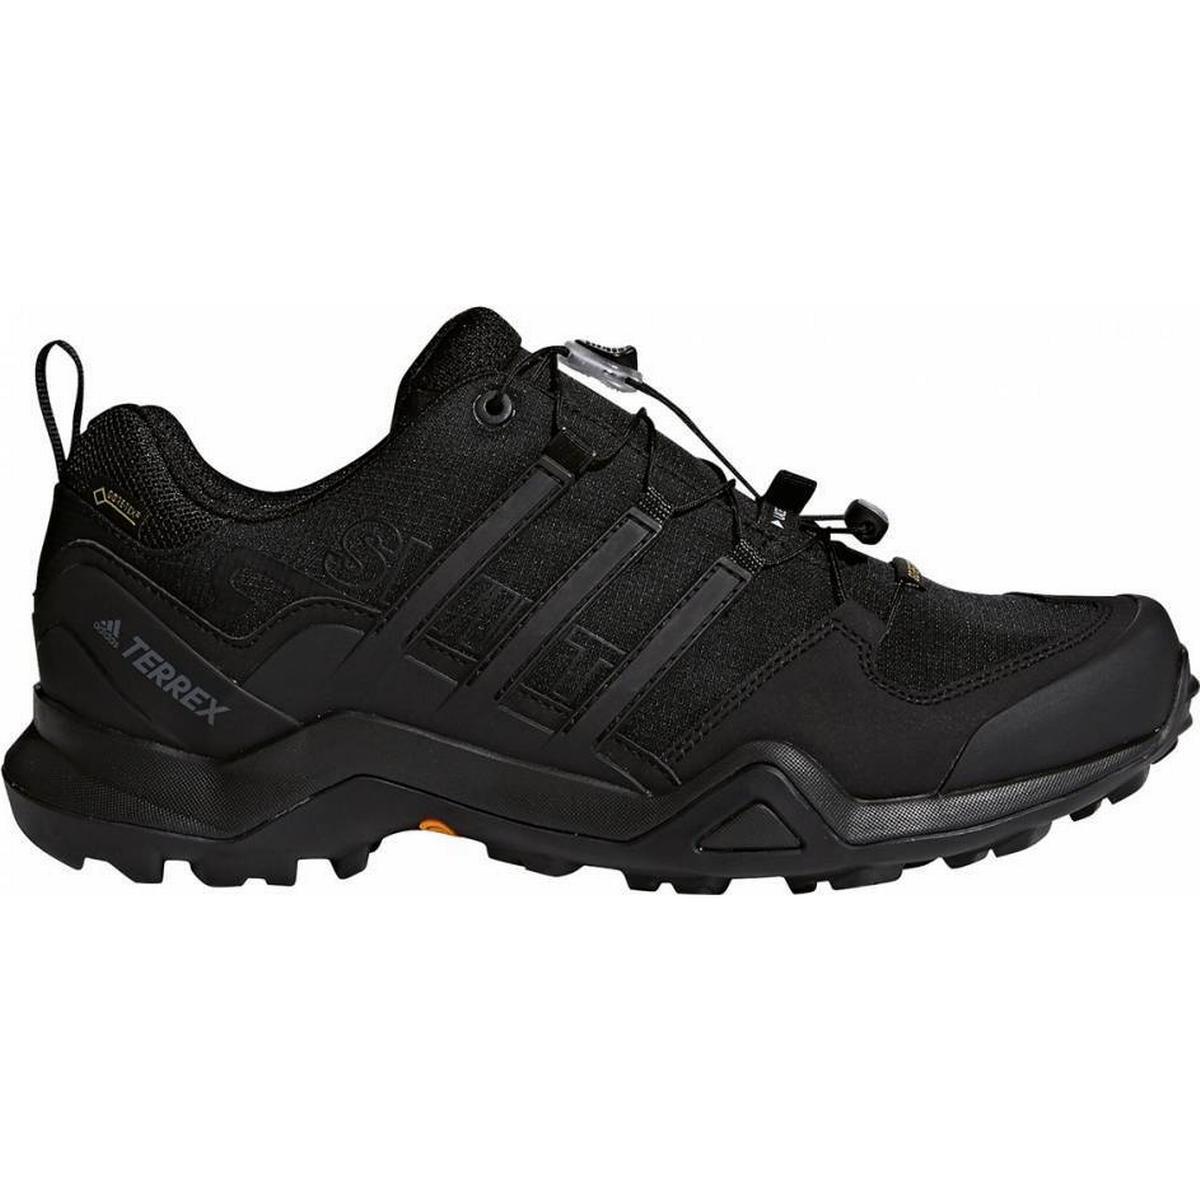 Adidas Trekkingskor (1000+ produkter) hos PriceRunner • Se